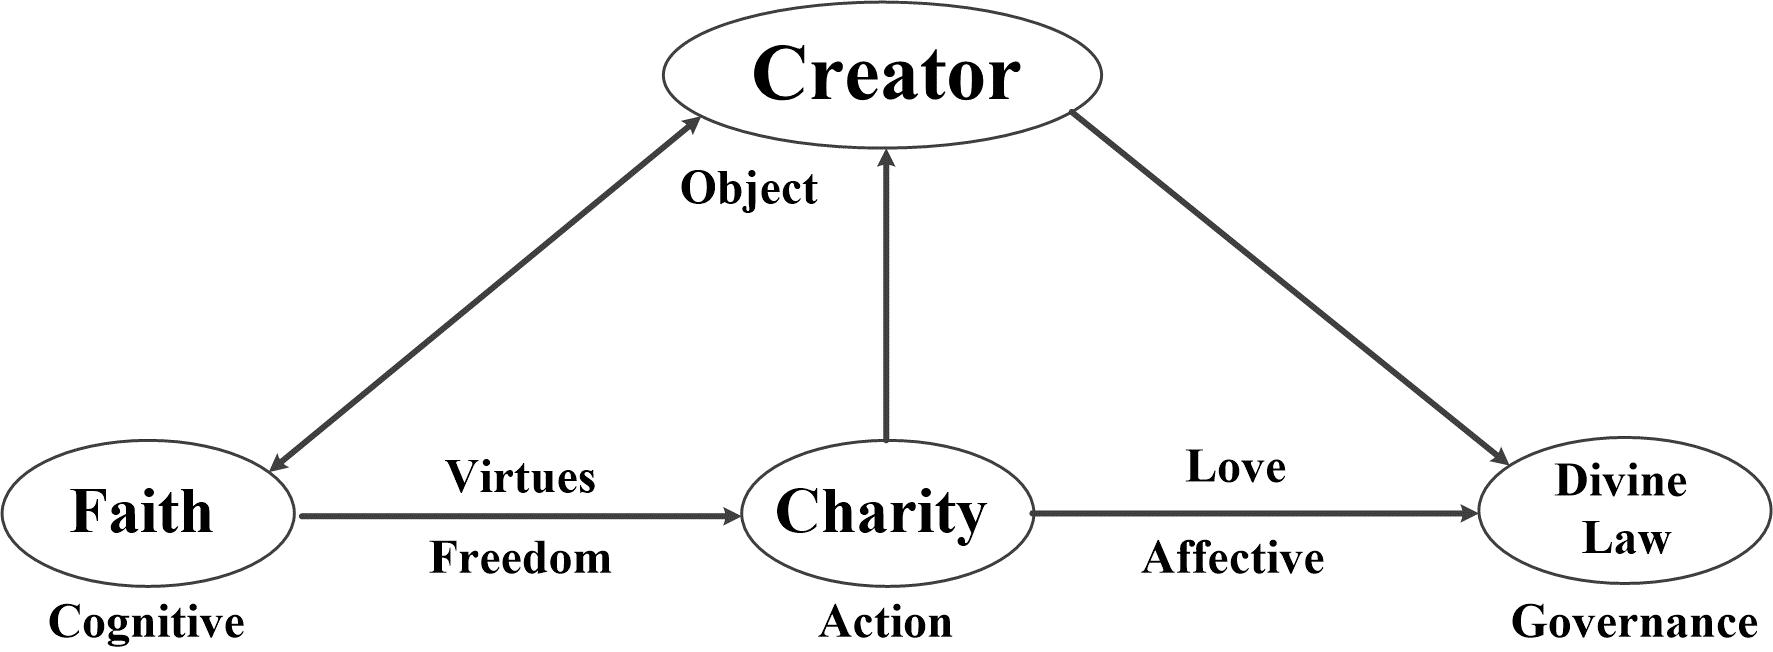 Creator Faith Divine Law and Charity